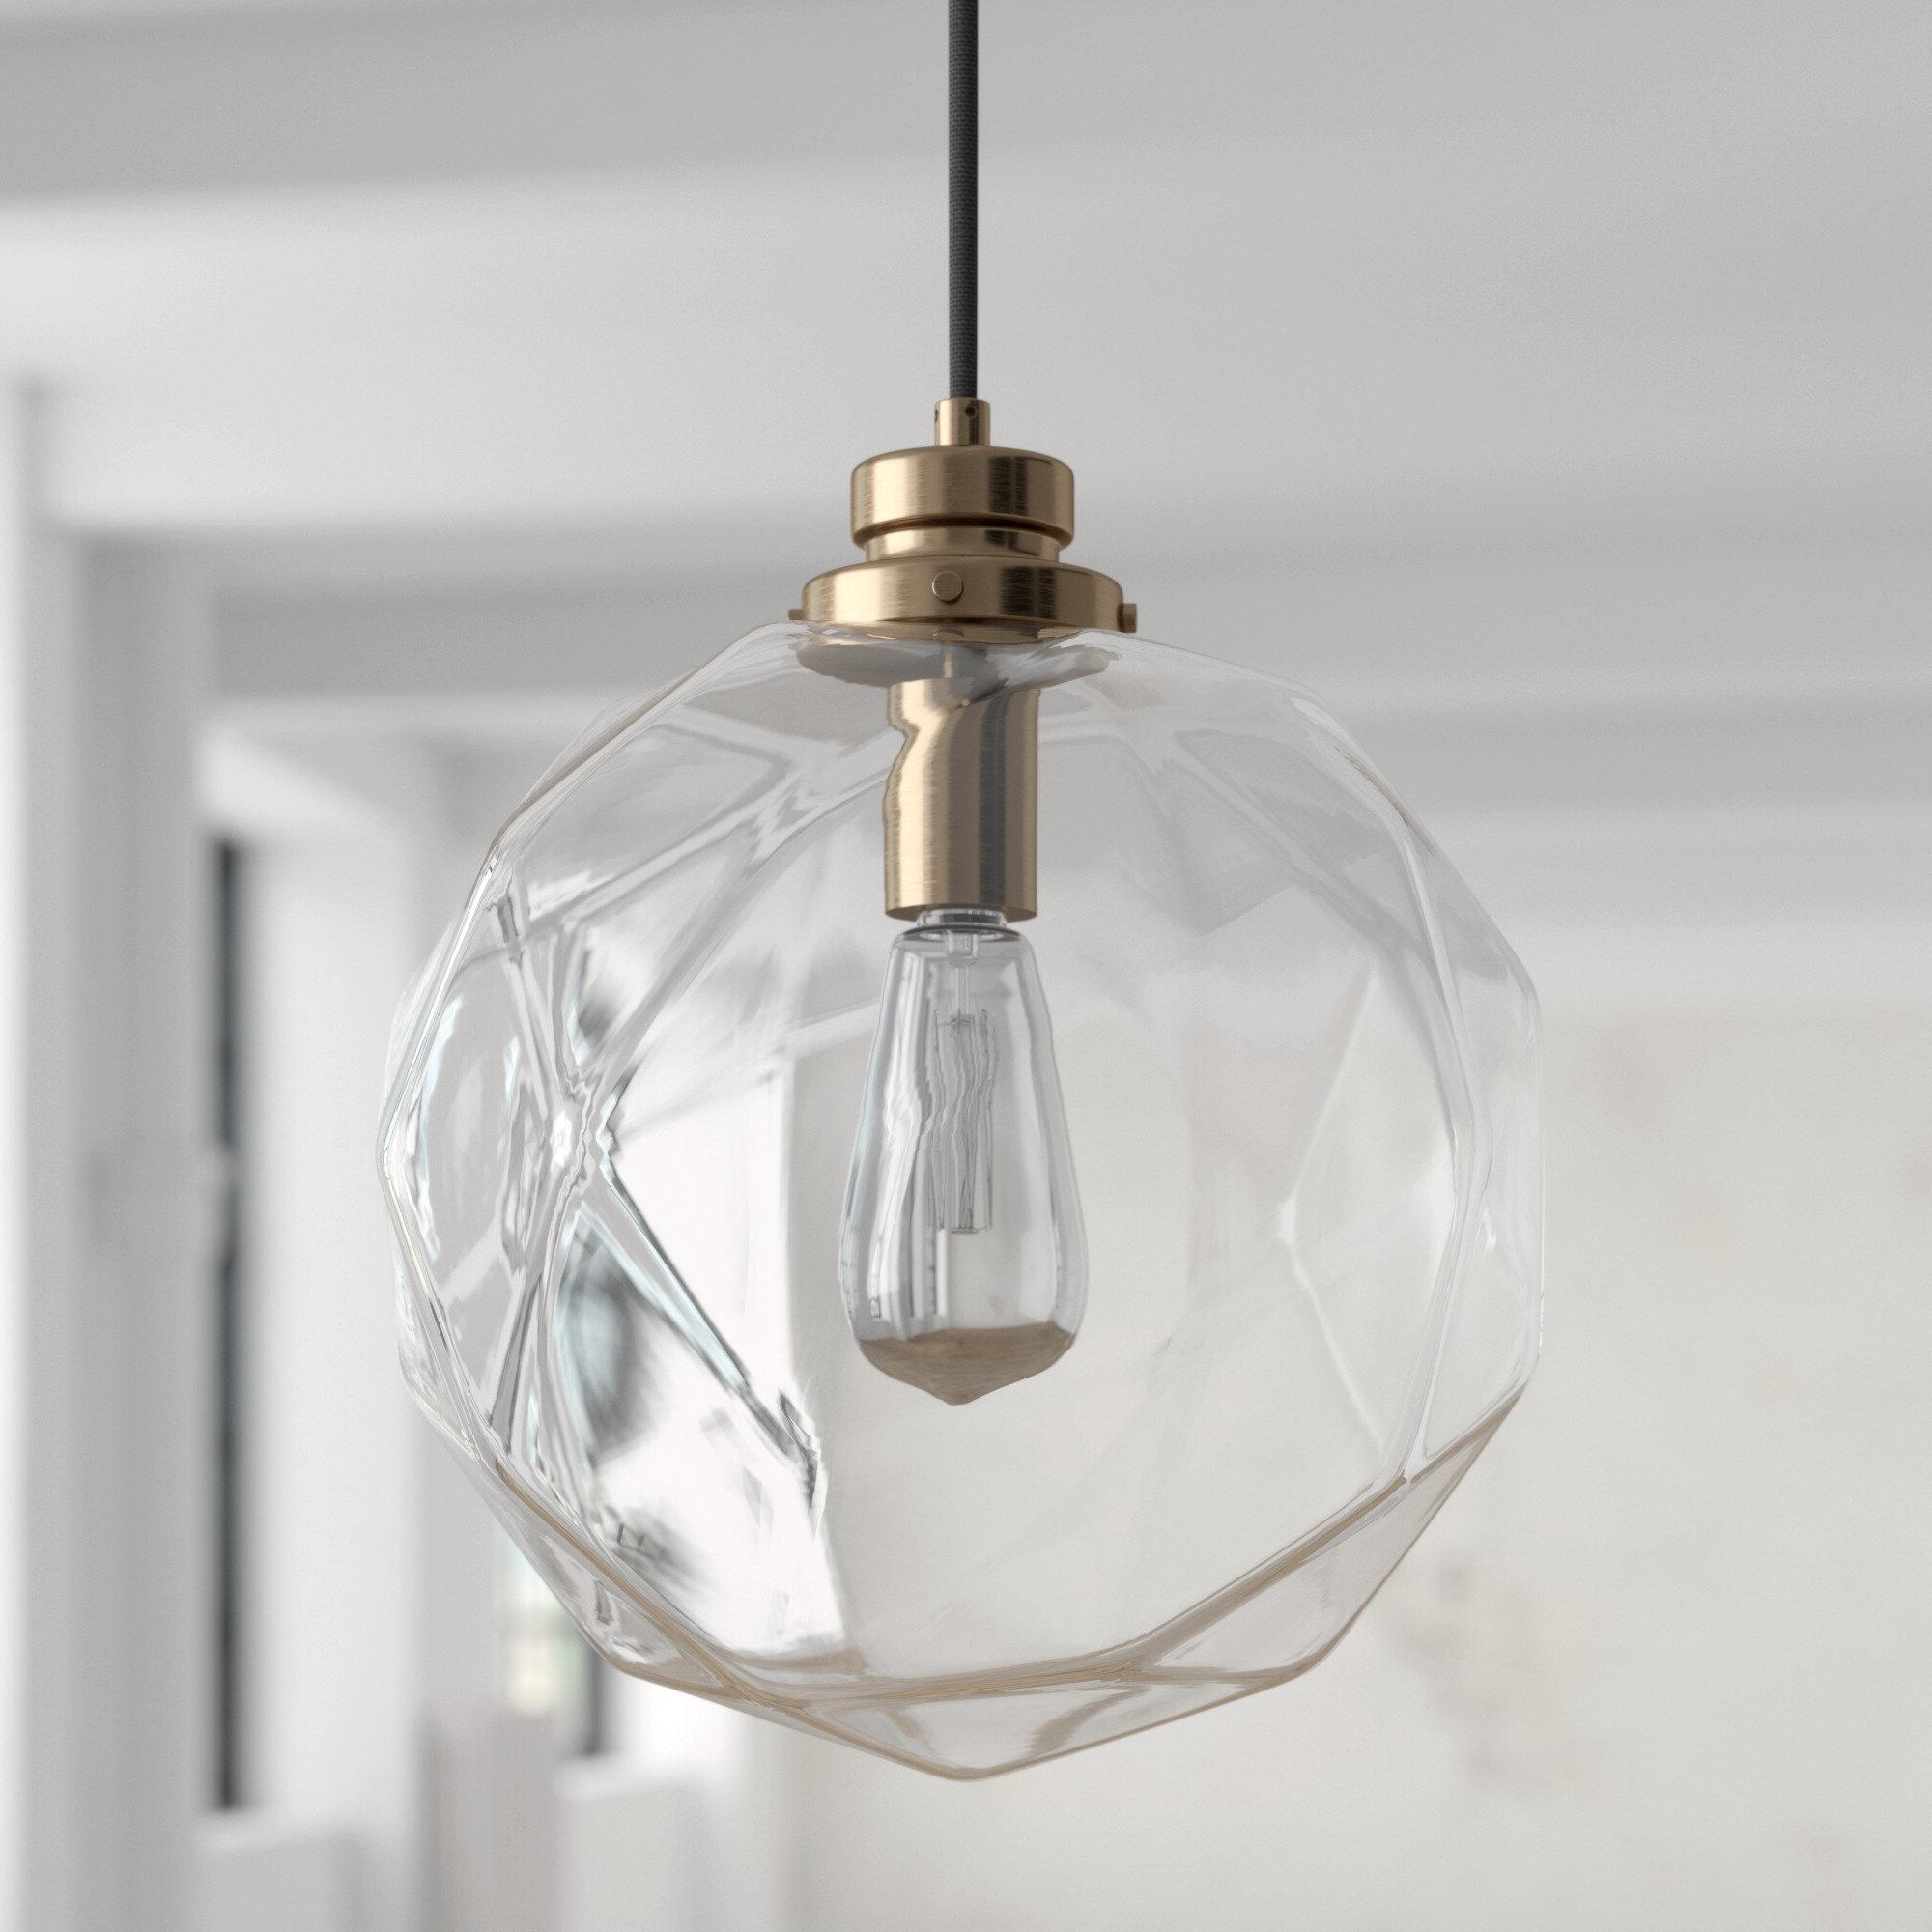 Roslindale 1 Light Single Bell Pendants Regarding Most Up To Date 1 Light Geometric Globe Pendant (Gallery 17 of 20)